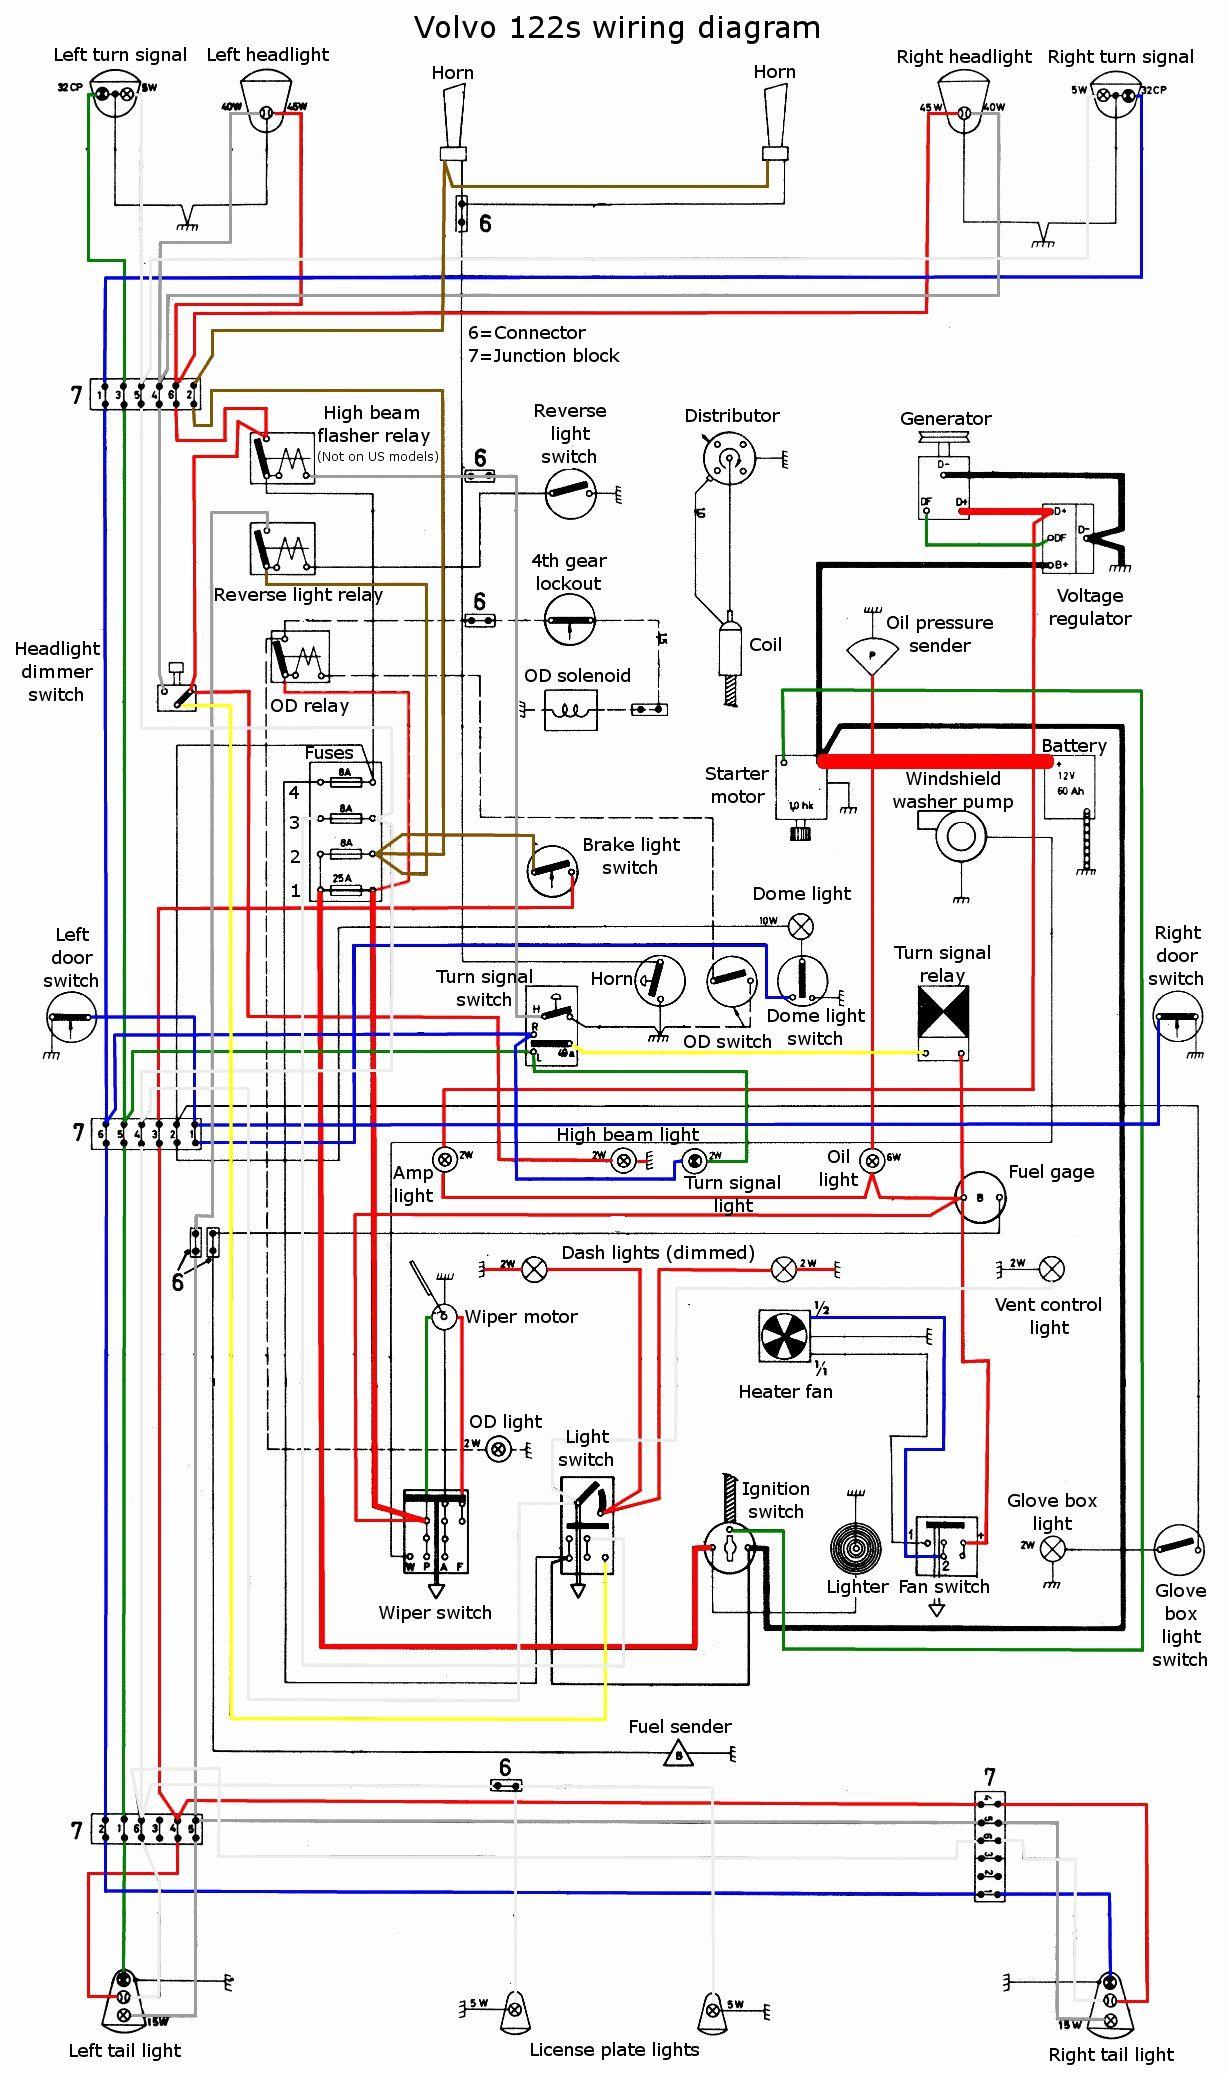 2007 Mitsubishi Eclipse Stereo Wiring Diagram Rockford Fosgate - Rockford Fosgate Wiring Diagram